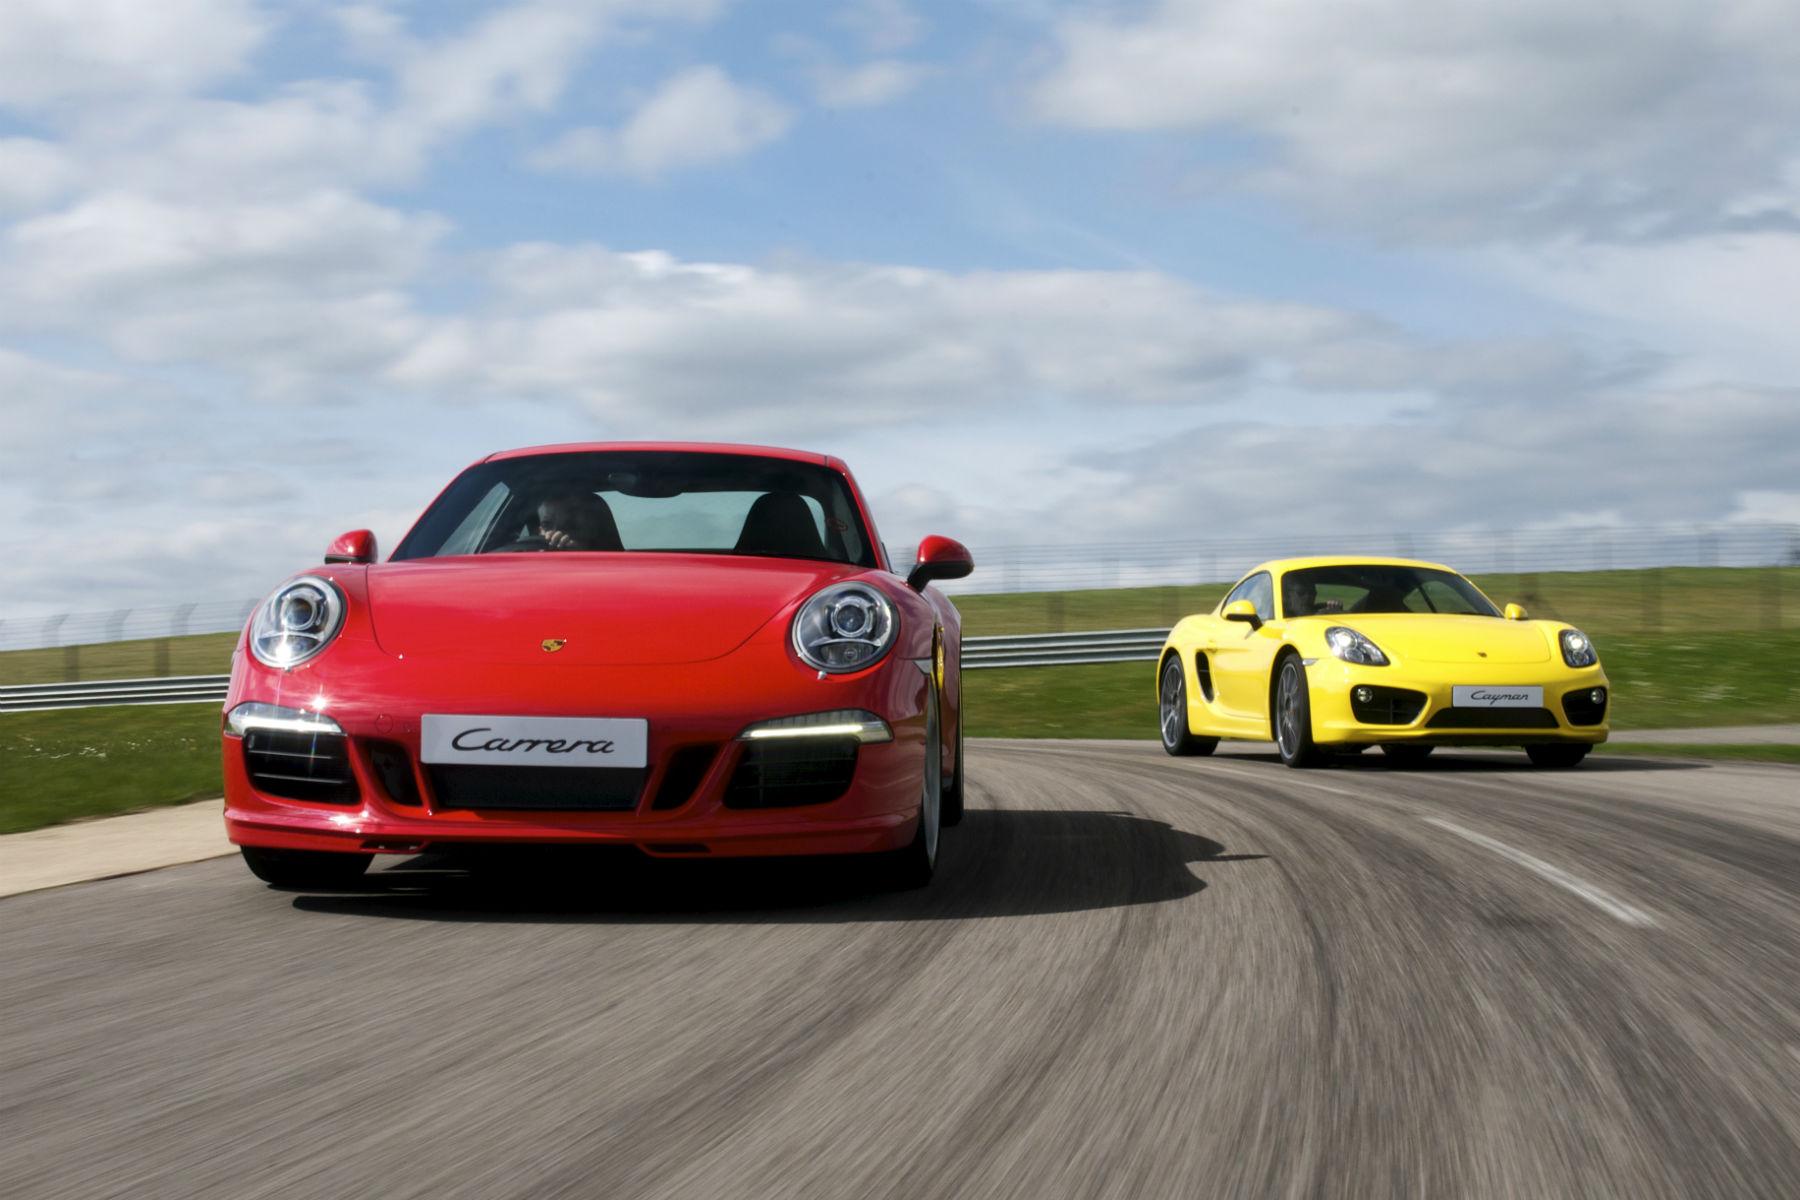 Porsche Experience Centre – Silverstone